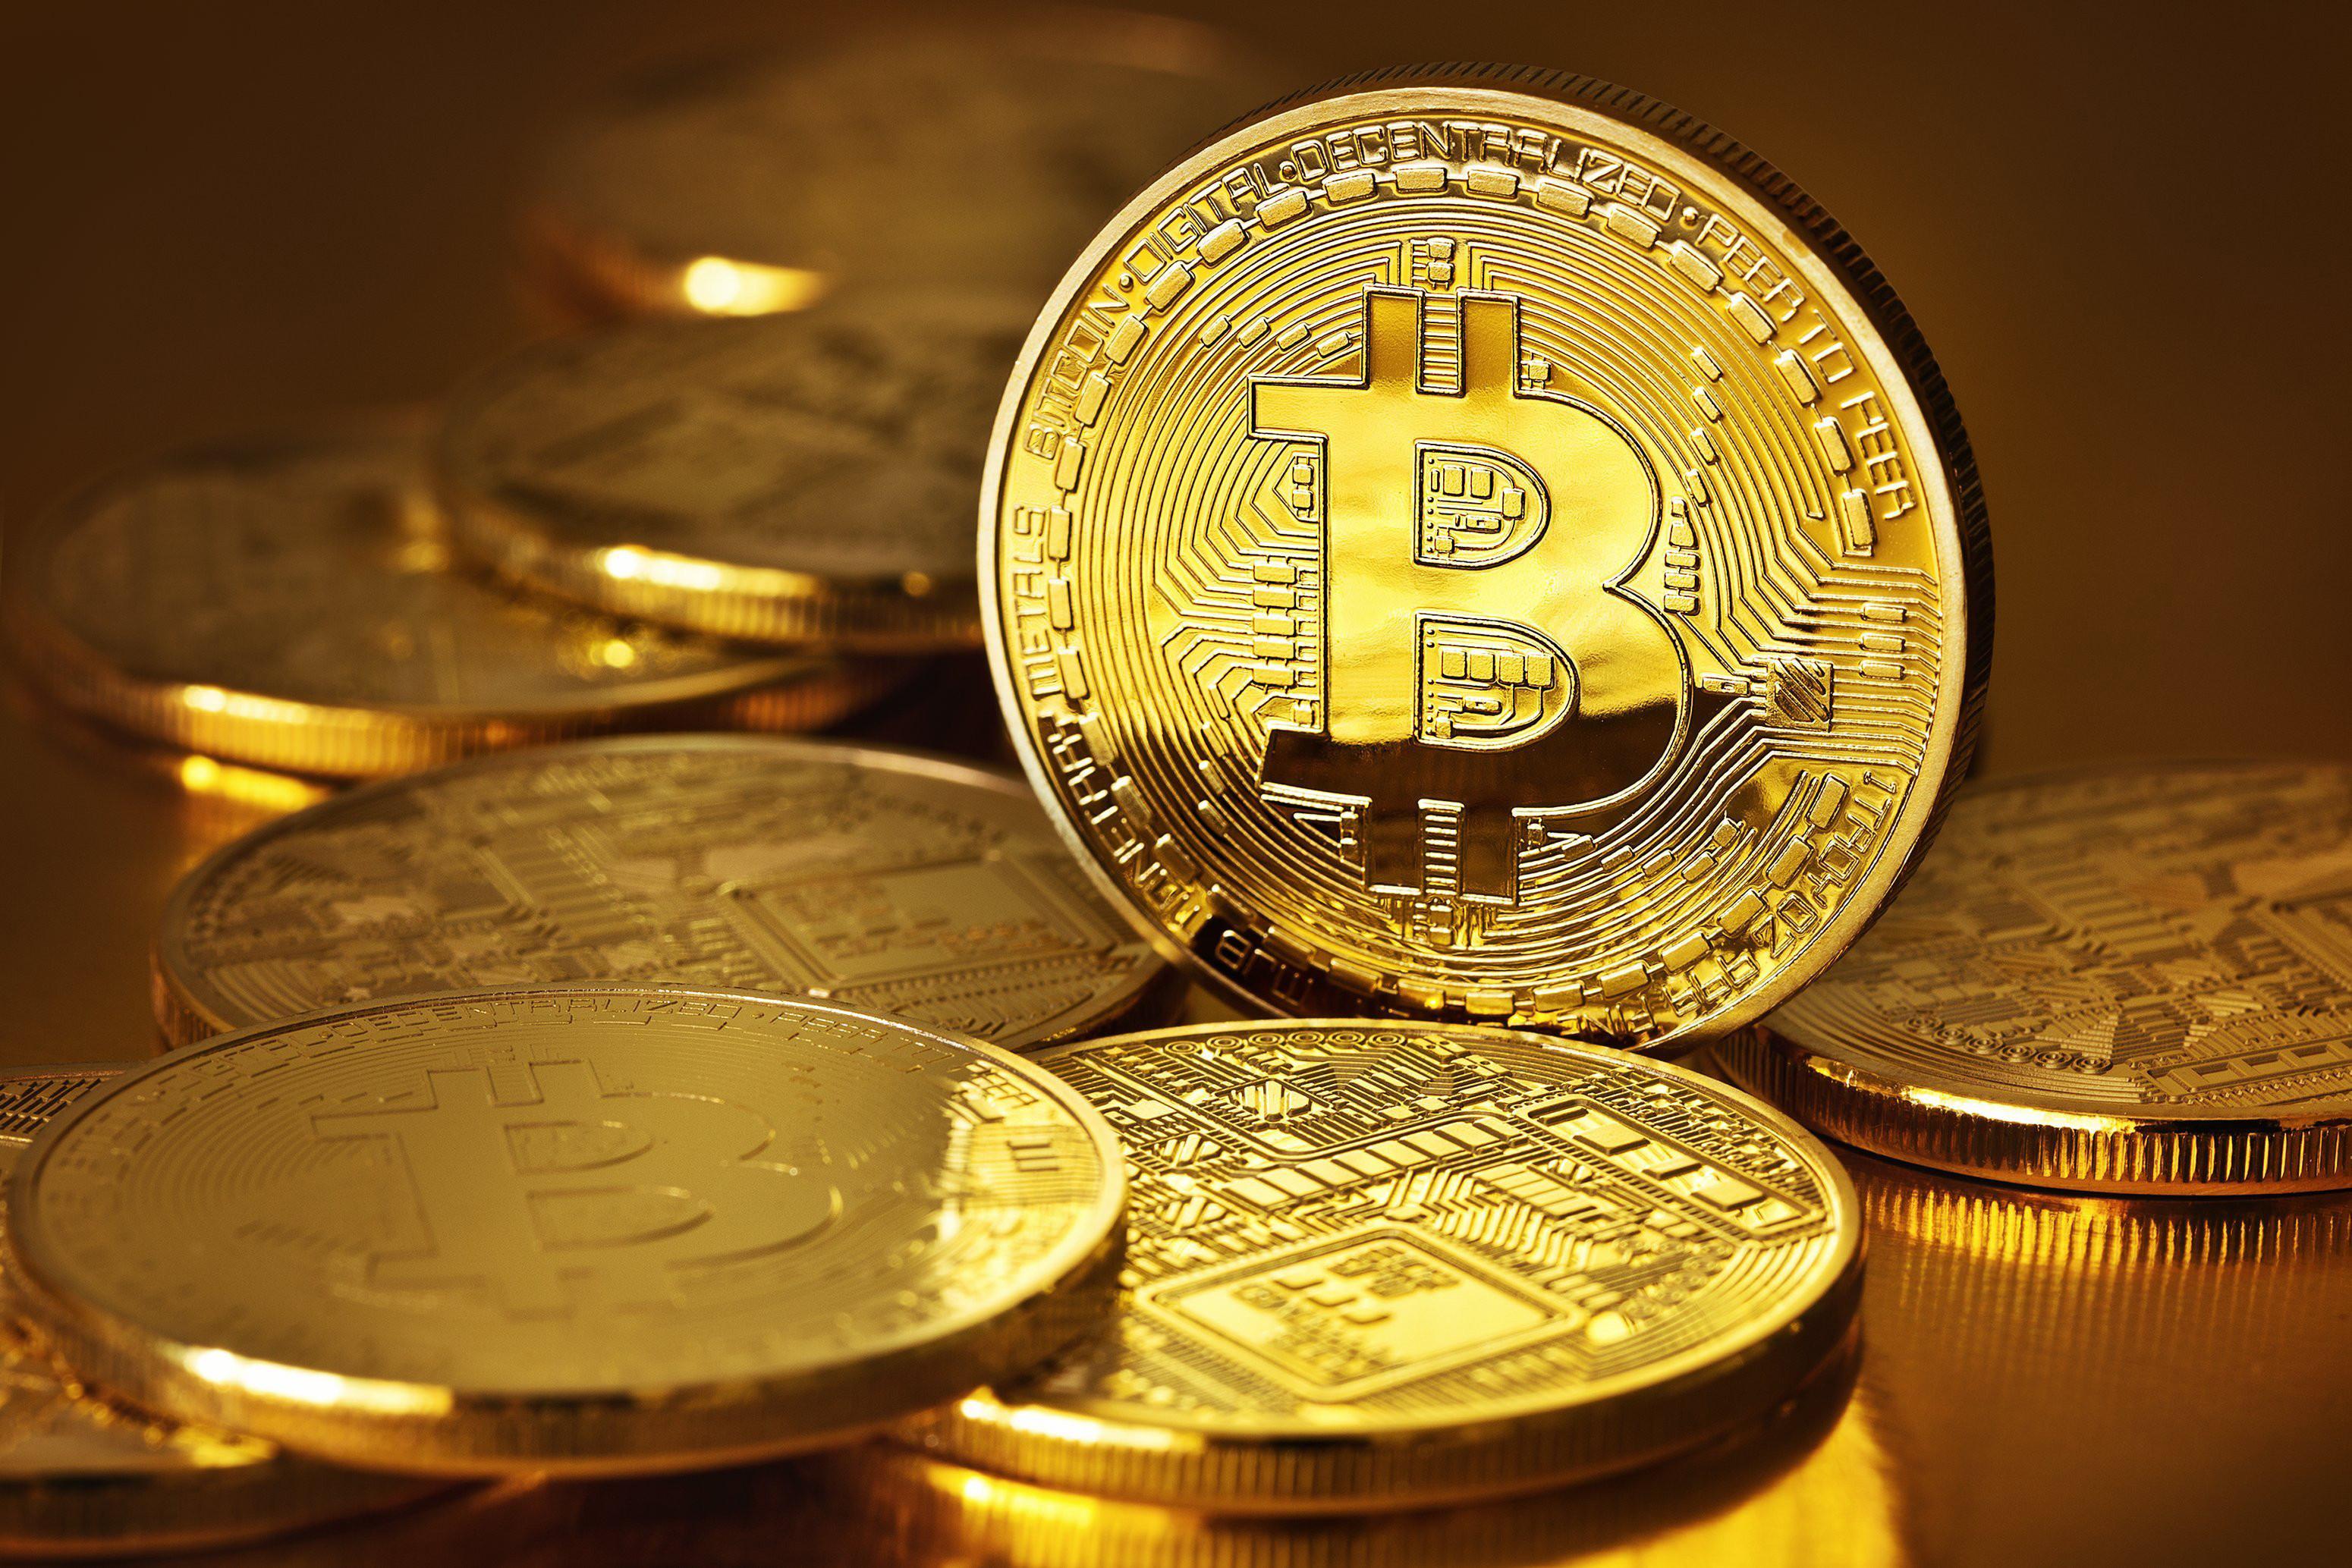 Dapatkah Bitcoin Gantikan Emas? - Triv Blog